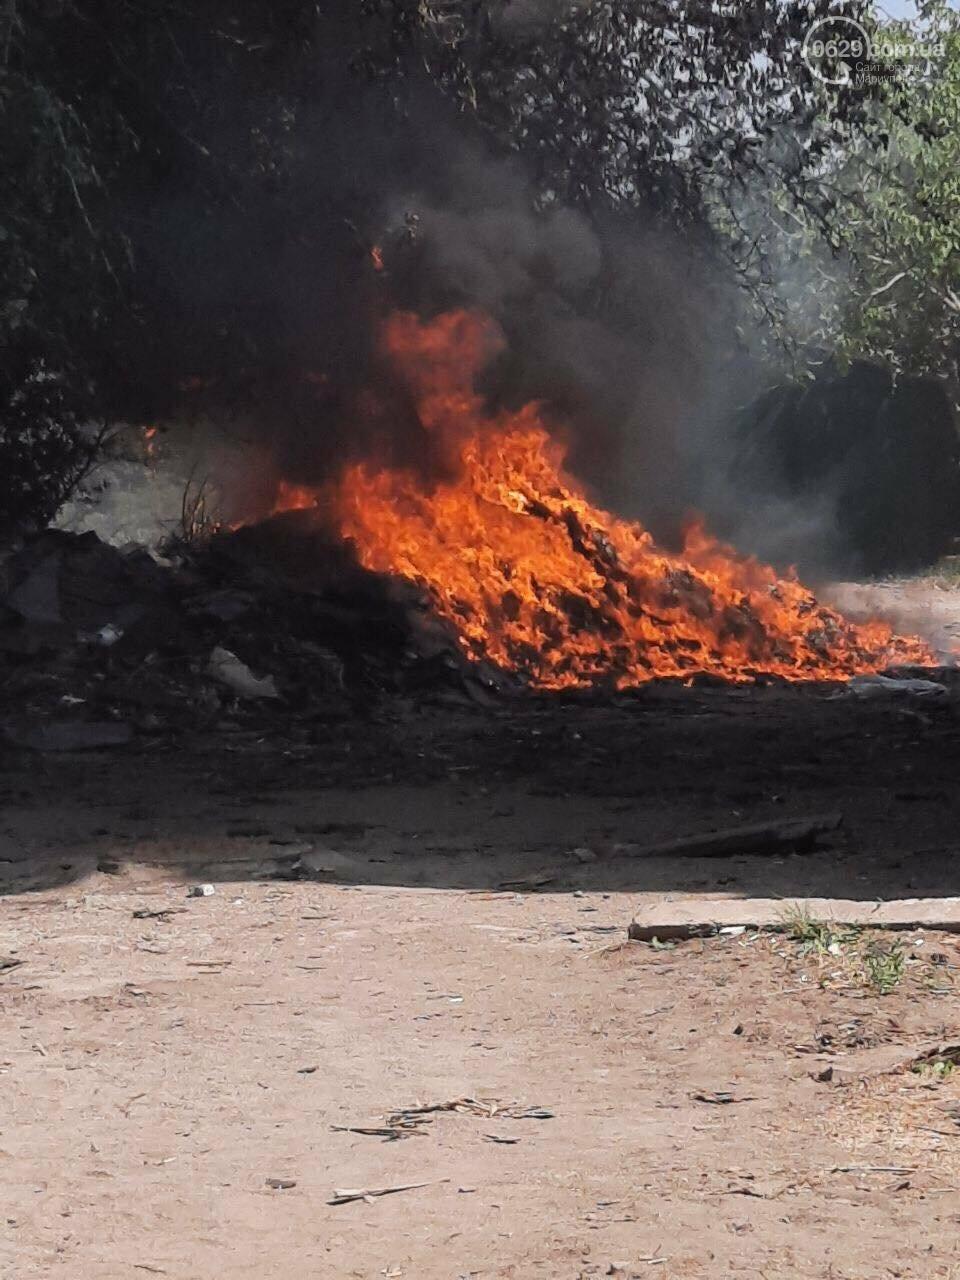 На Левобережье Мариуполя произошло два пожара, - ФОТО, фото-1